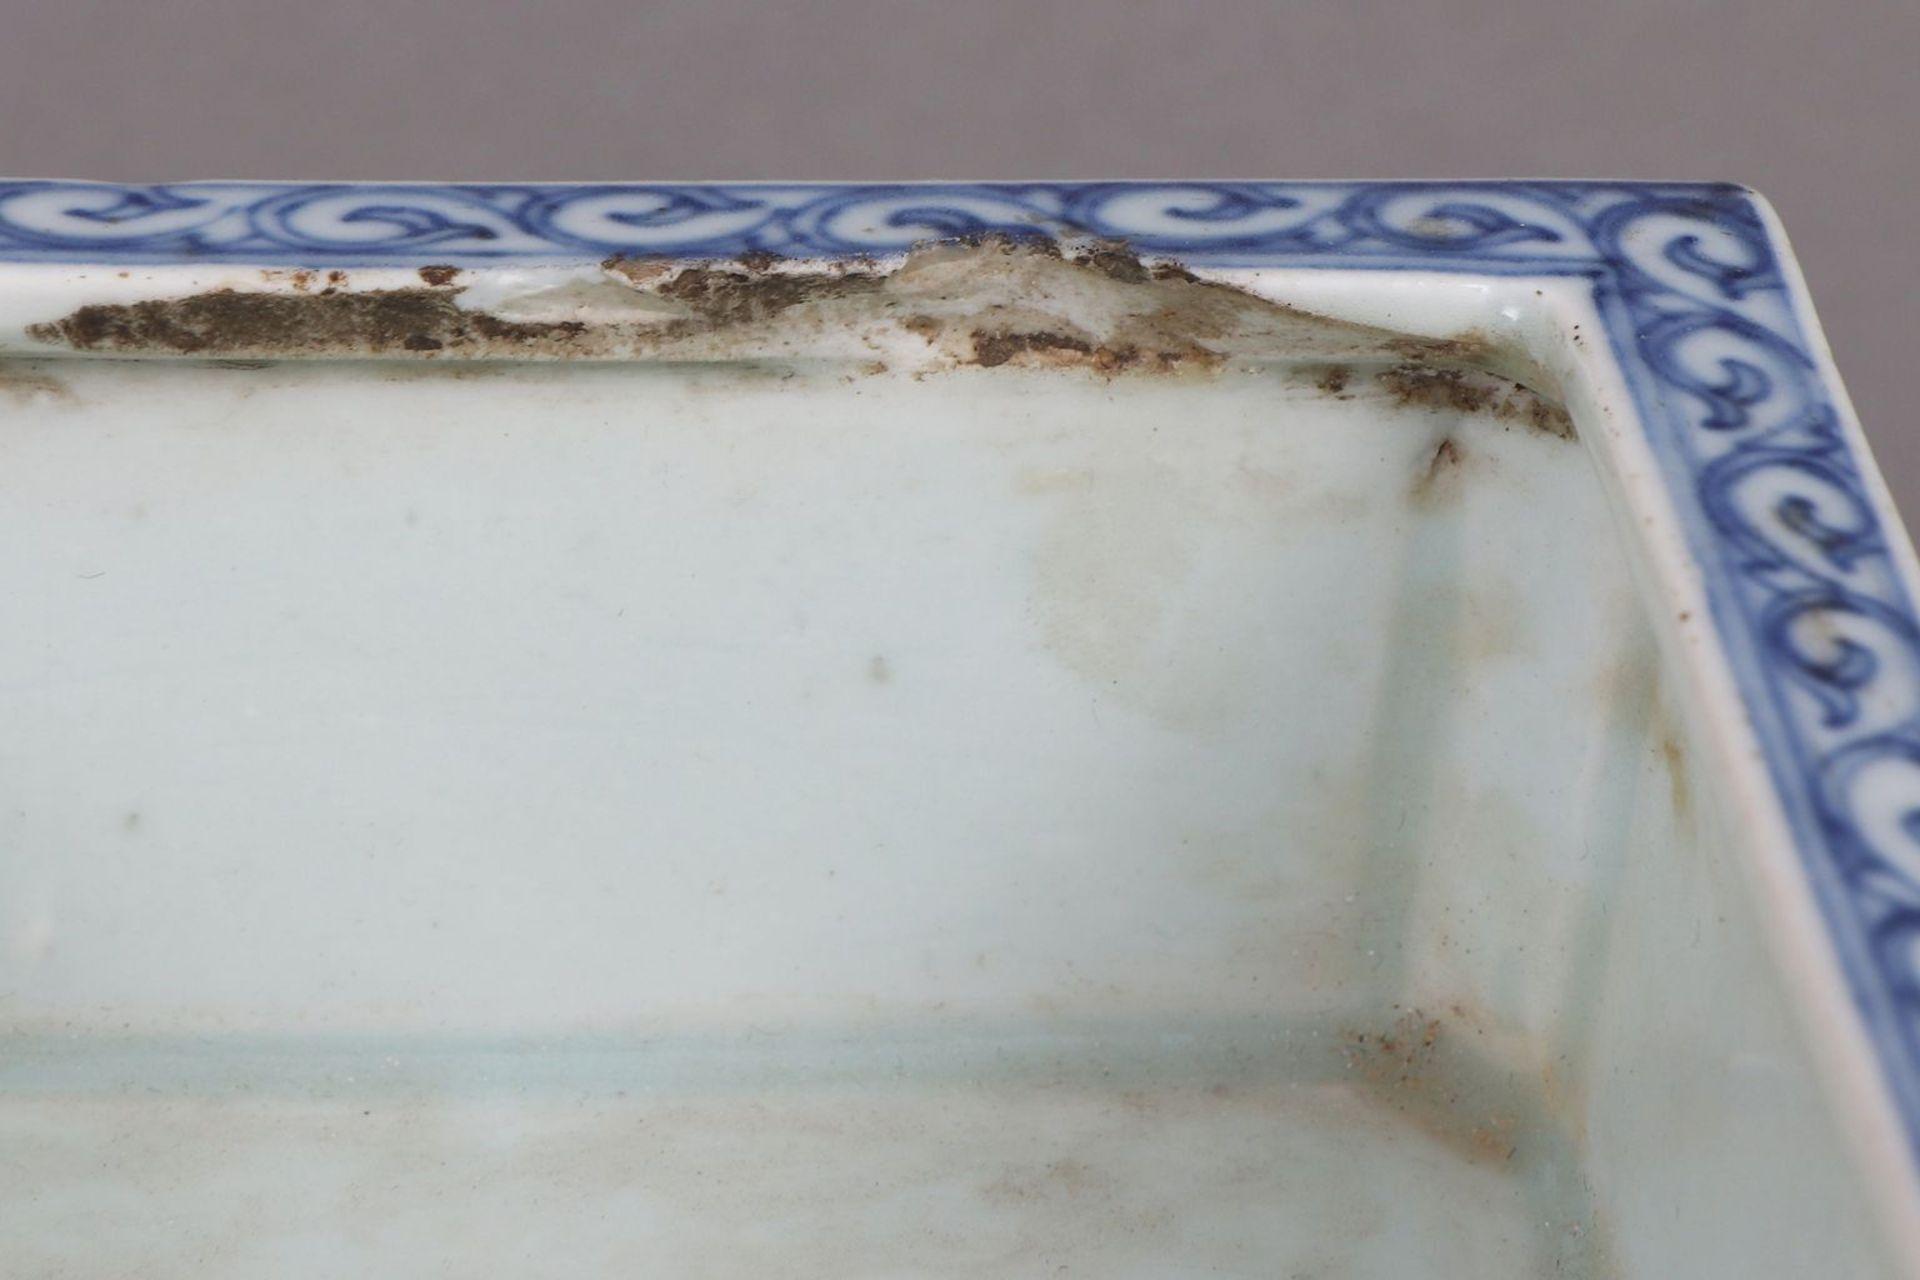 Chinesische Bonsai-Pflanzschale - Image 4 of 4